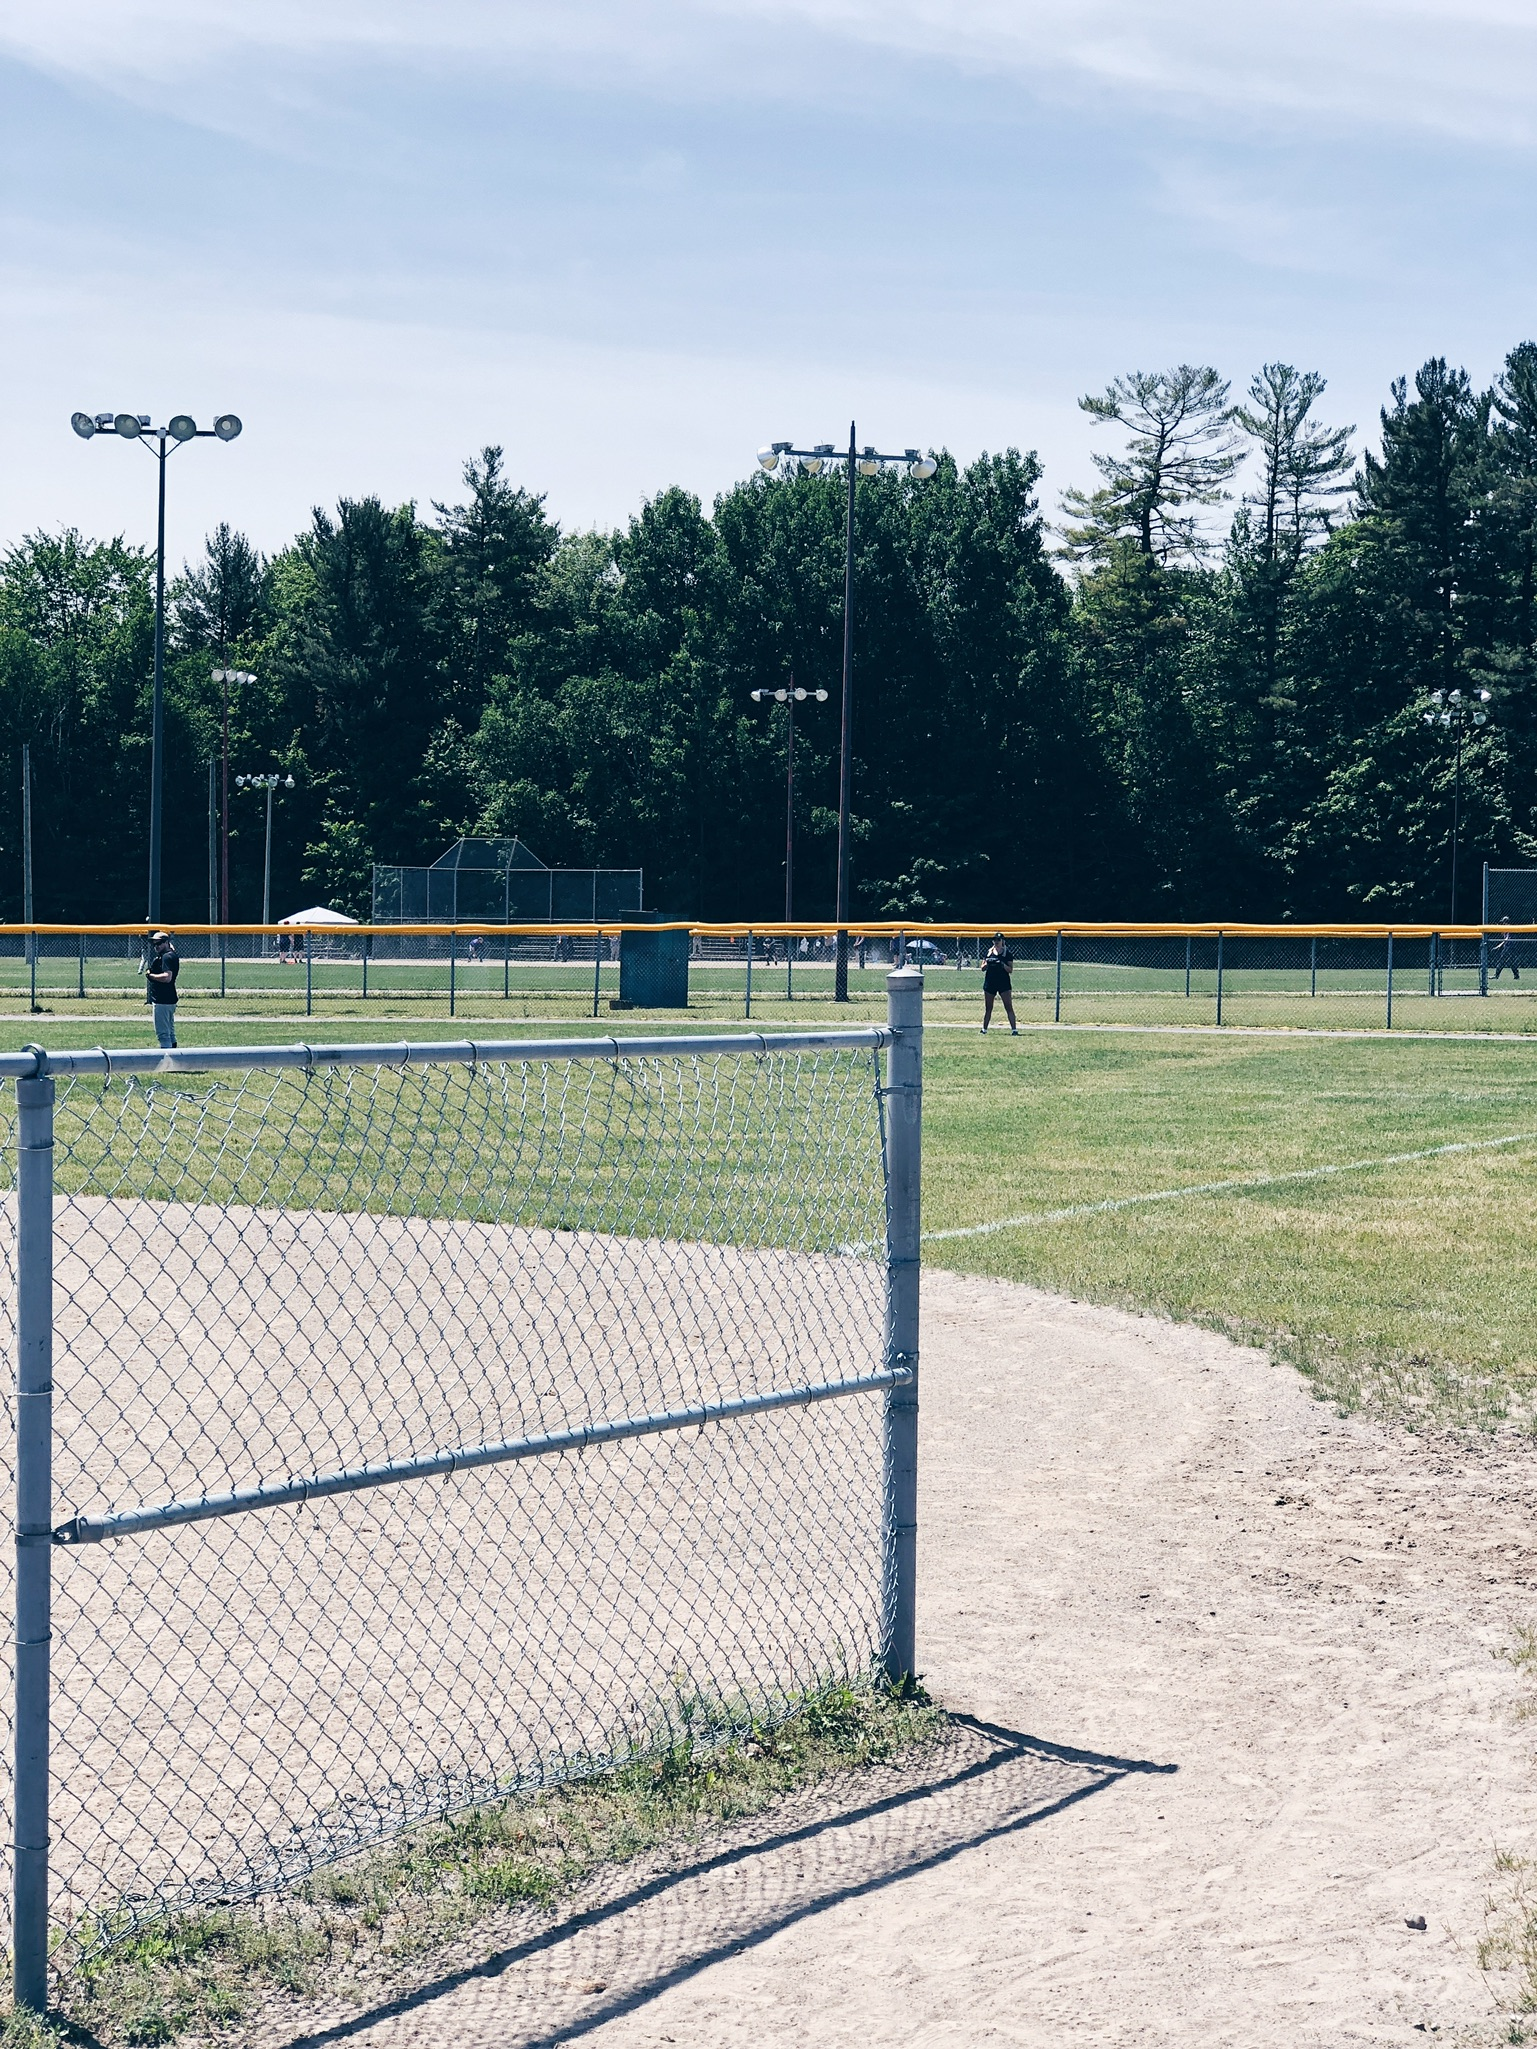 softball field in summer